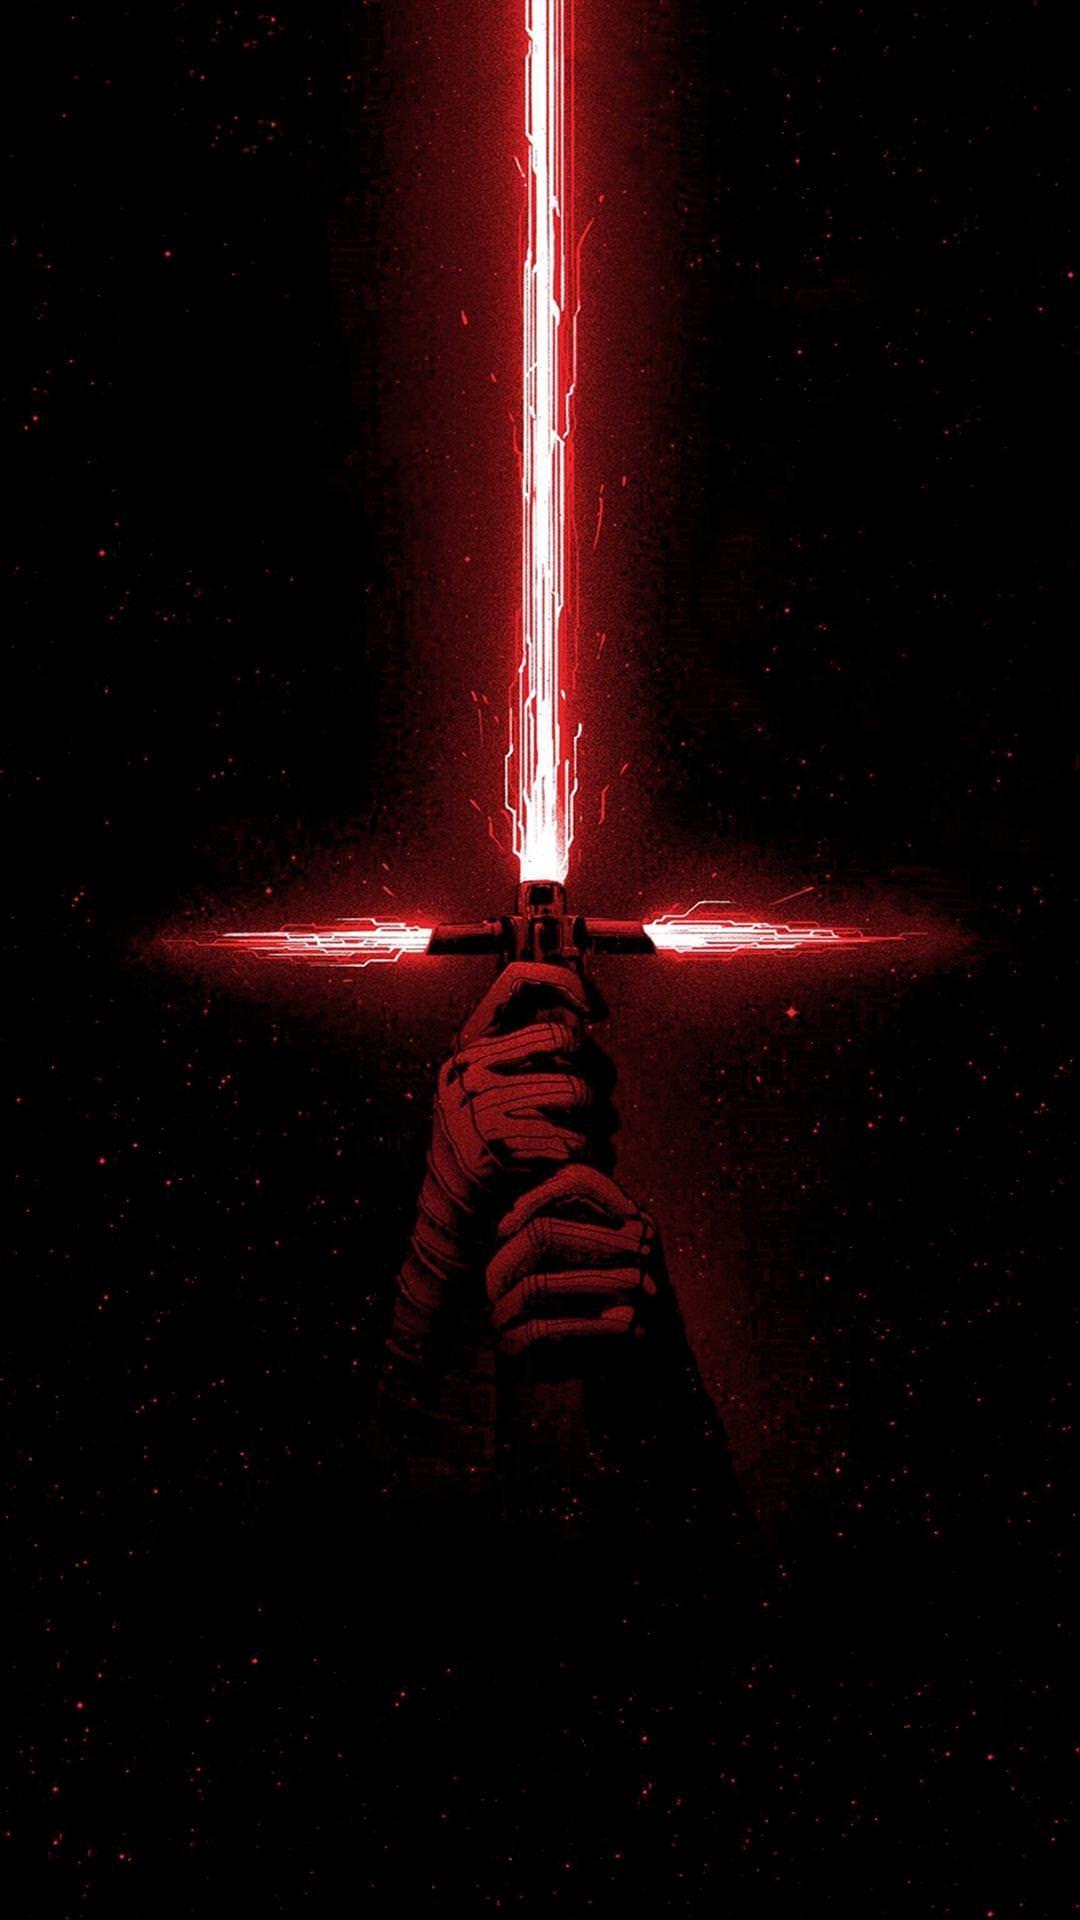 The Last Jedi 1080x1920 Star Wars Wallpaper Star Wars Background Star Wars Images